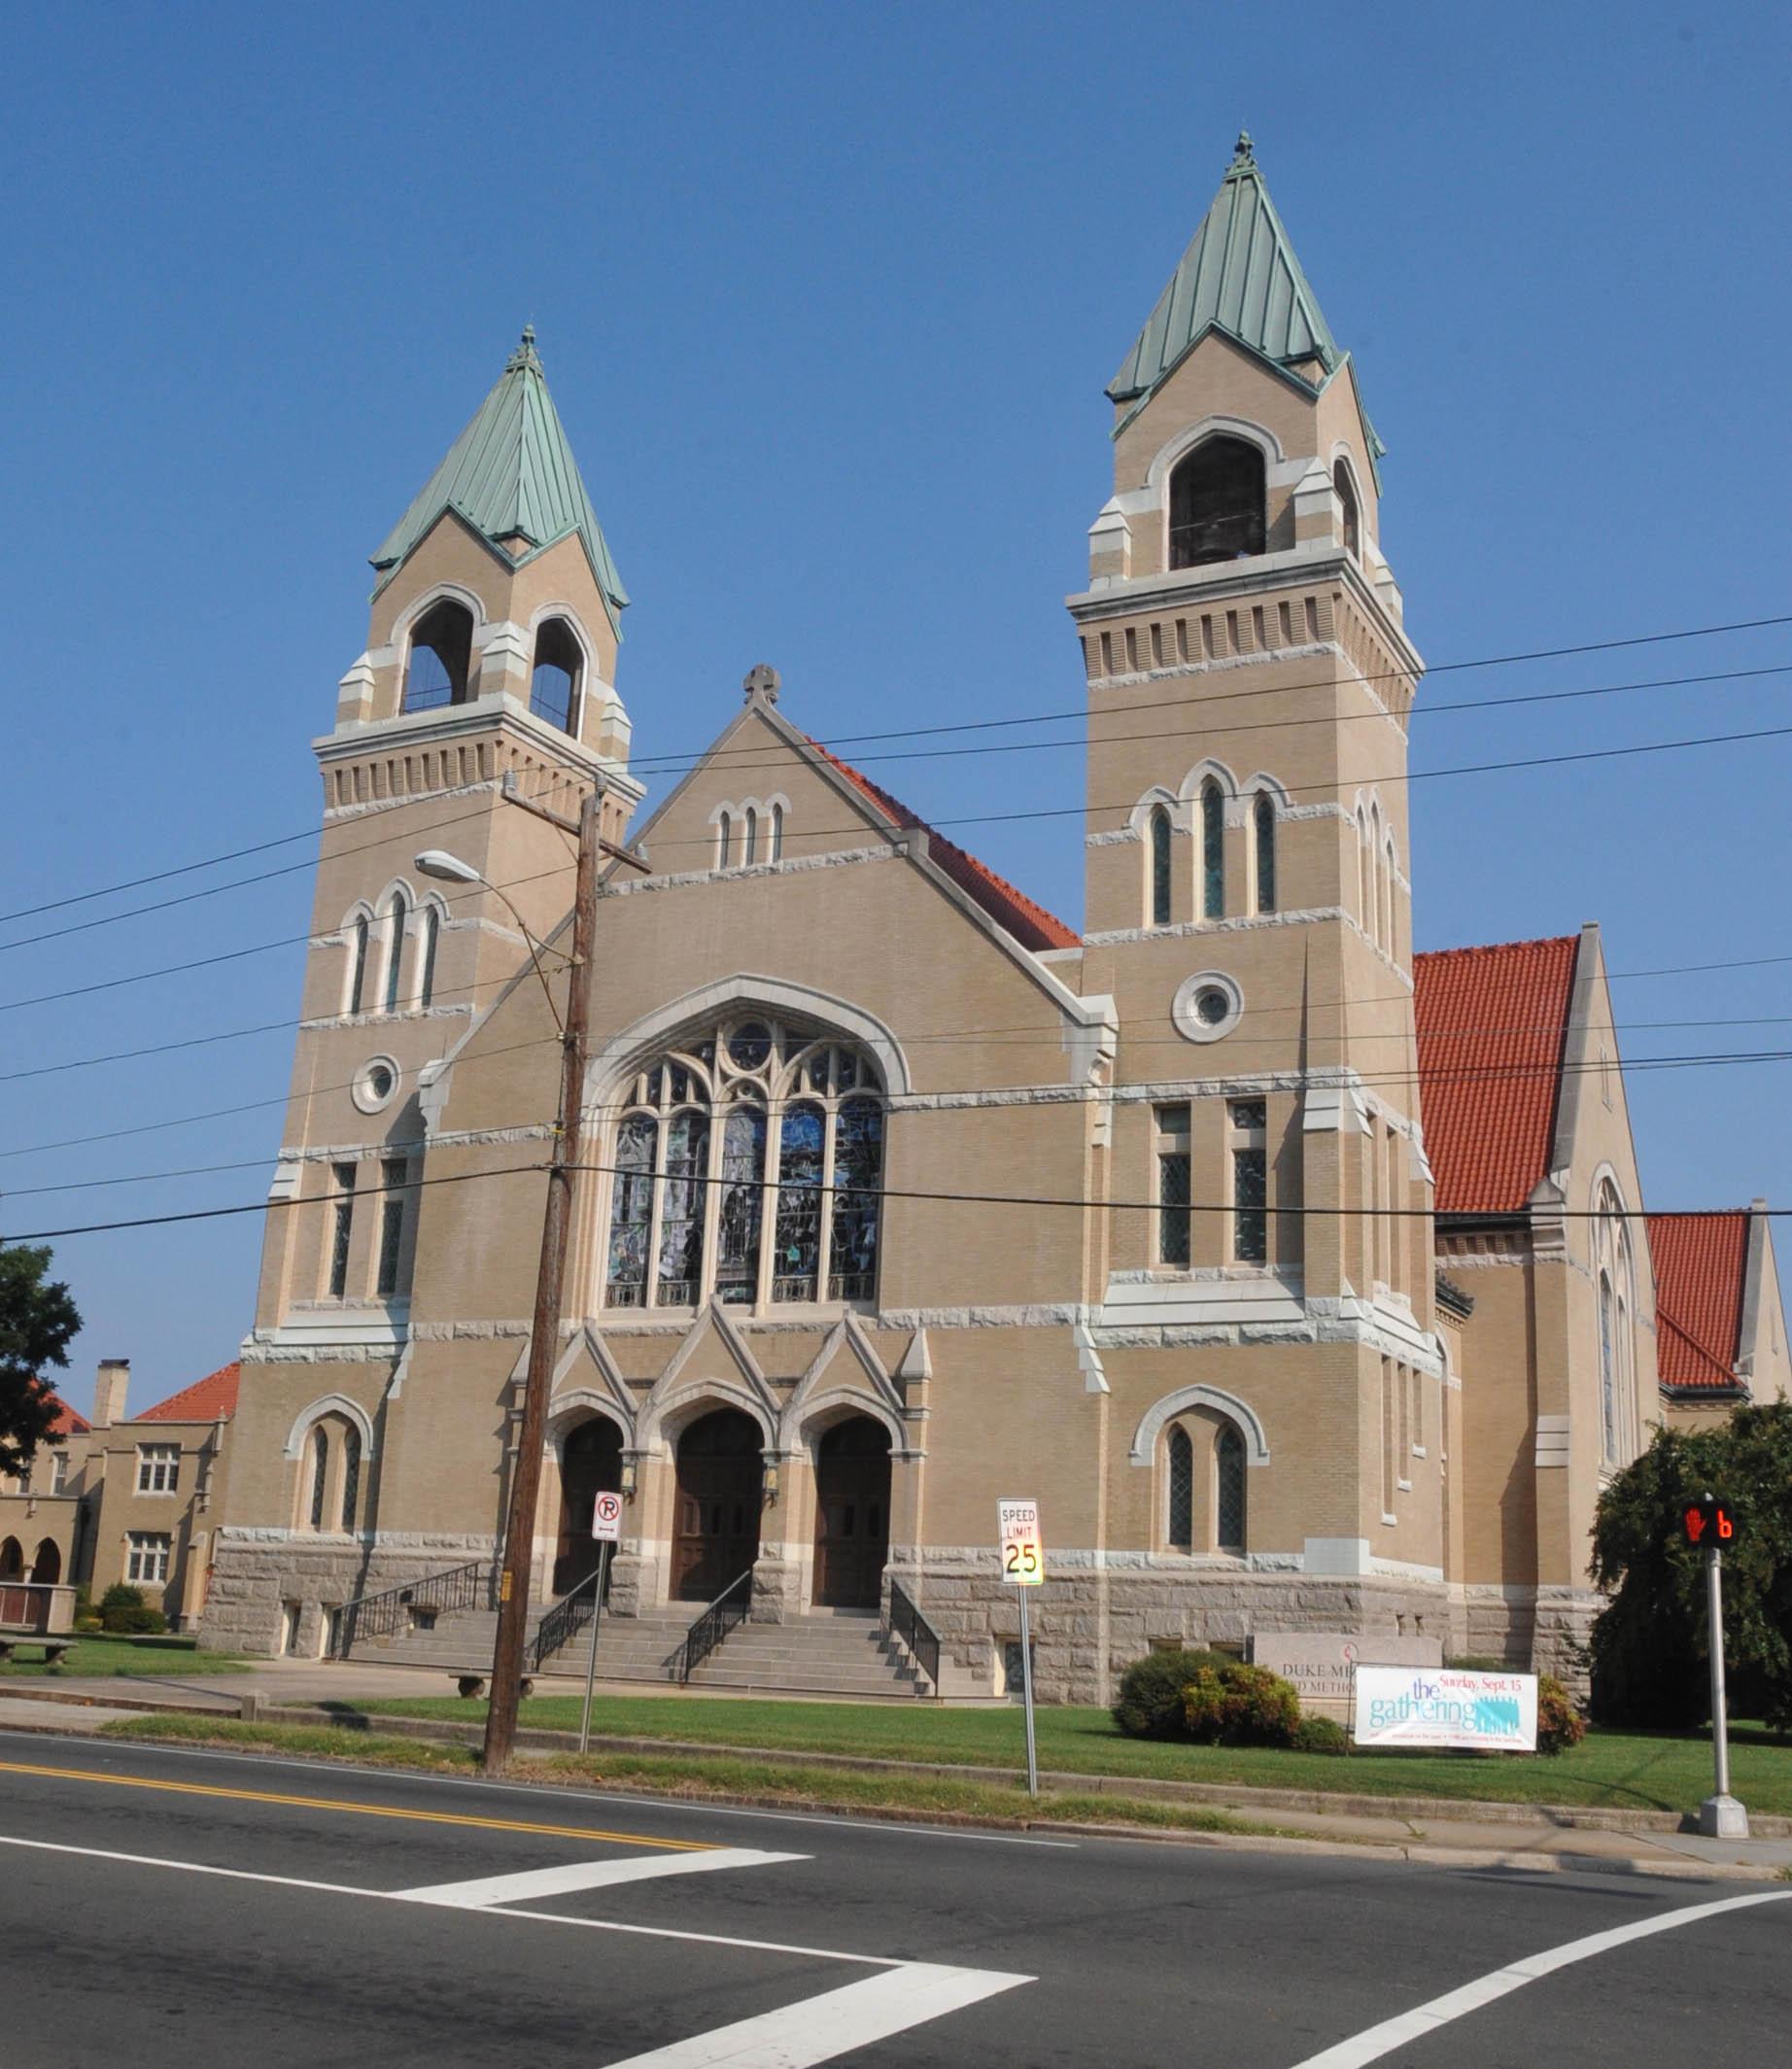 Durham Nc Commons At University Place: File:DUKE MEMORIAL UNITED METHODIST CHURCH, DURHAM COUNTY